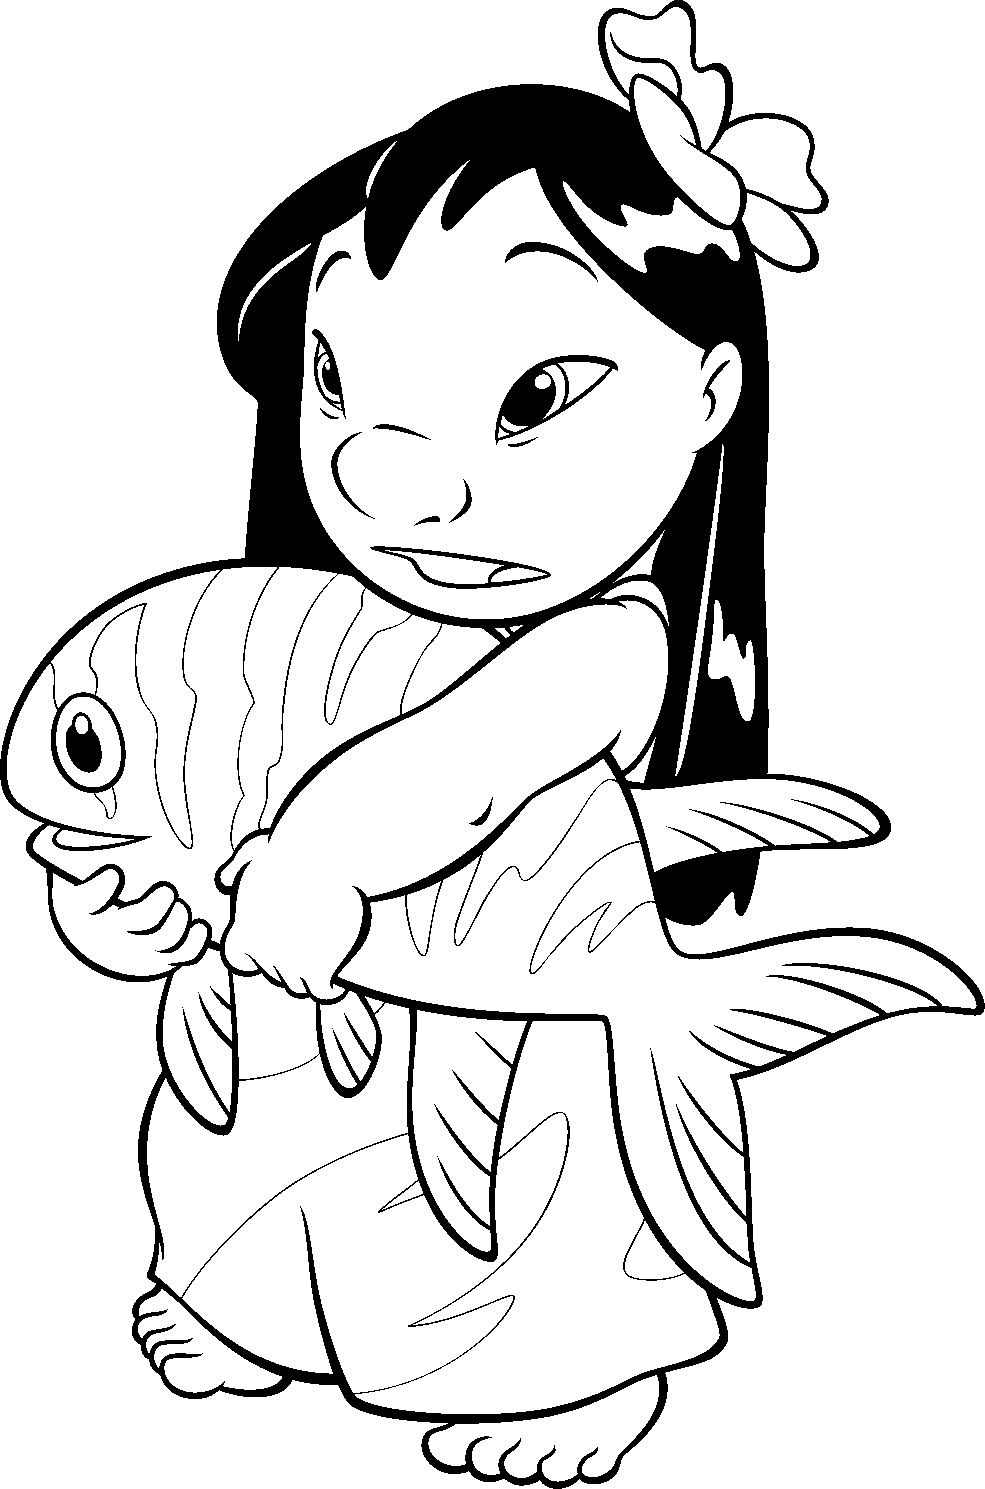 Princesas disney dibujos para colorear de lilo y stitch for Lilo and stitch coloring book pages